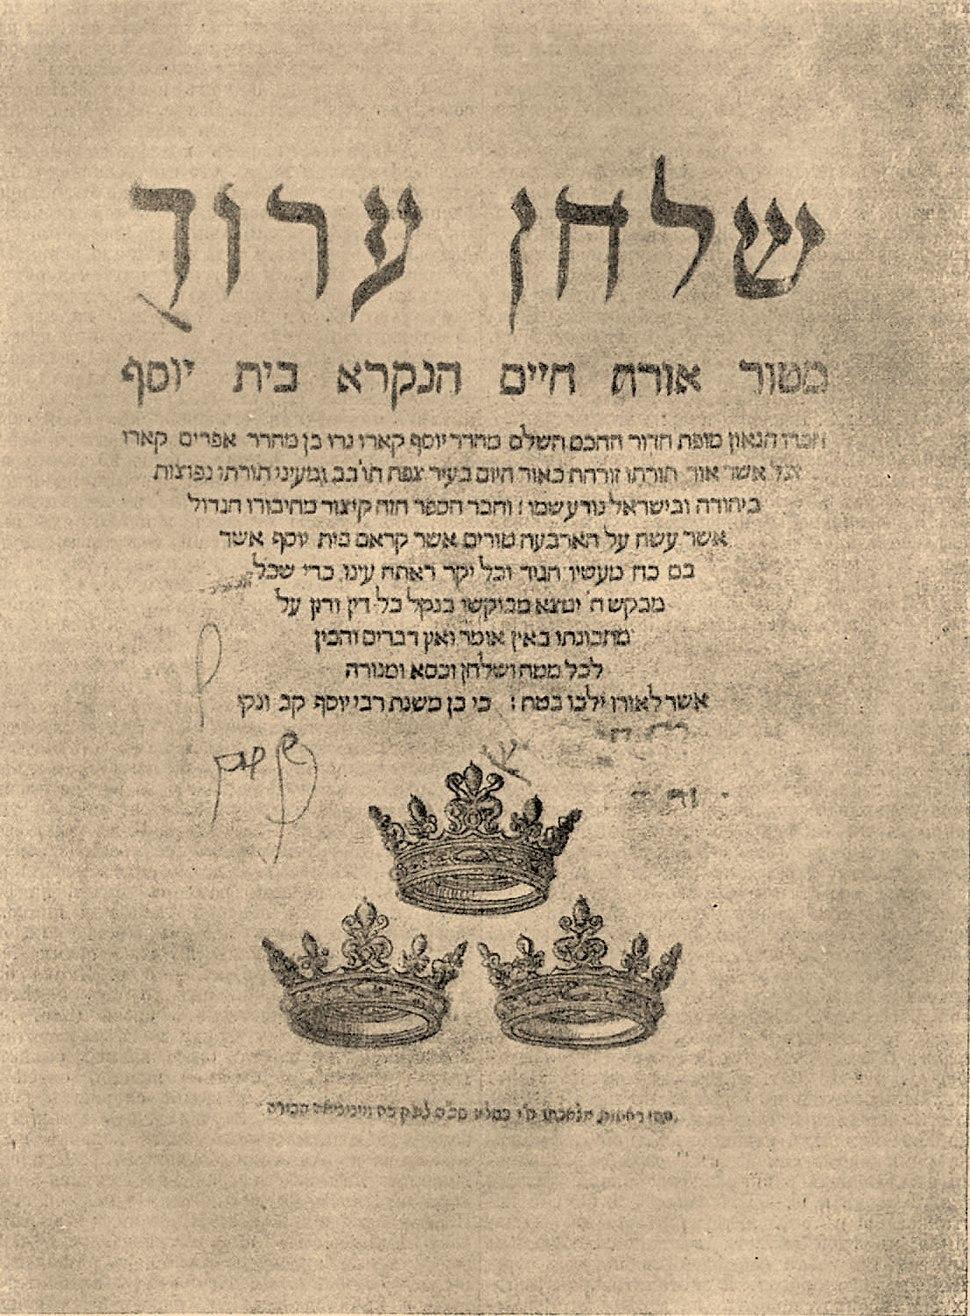 Brockhaus and Efron Jewish Encyclopedia e9 327-0